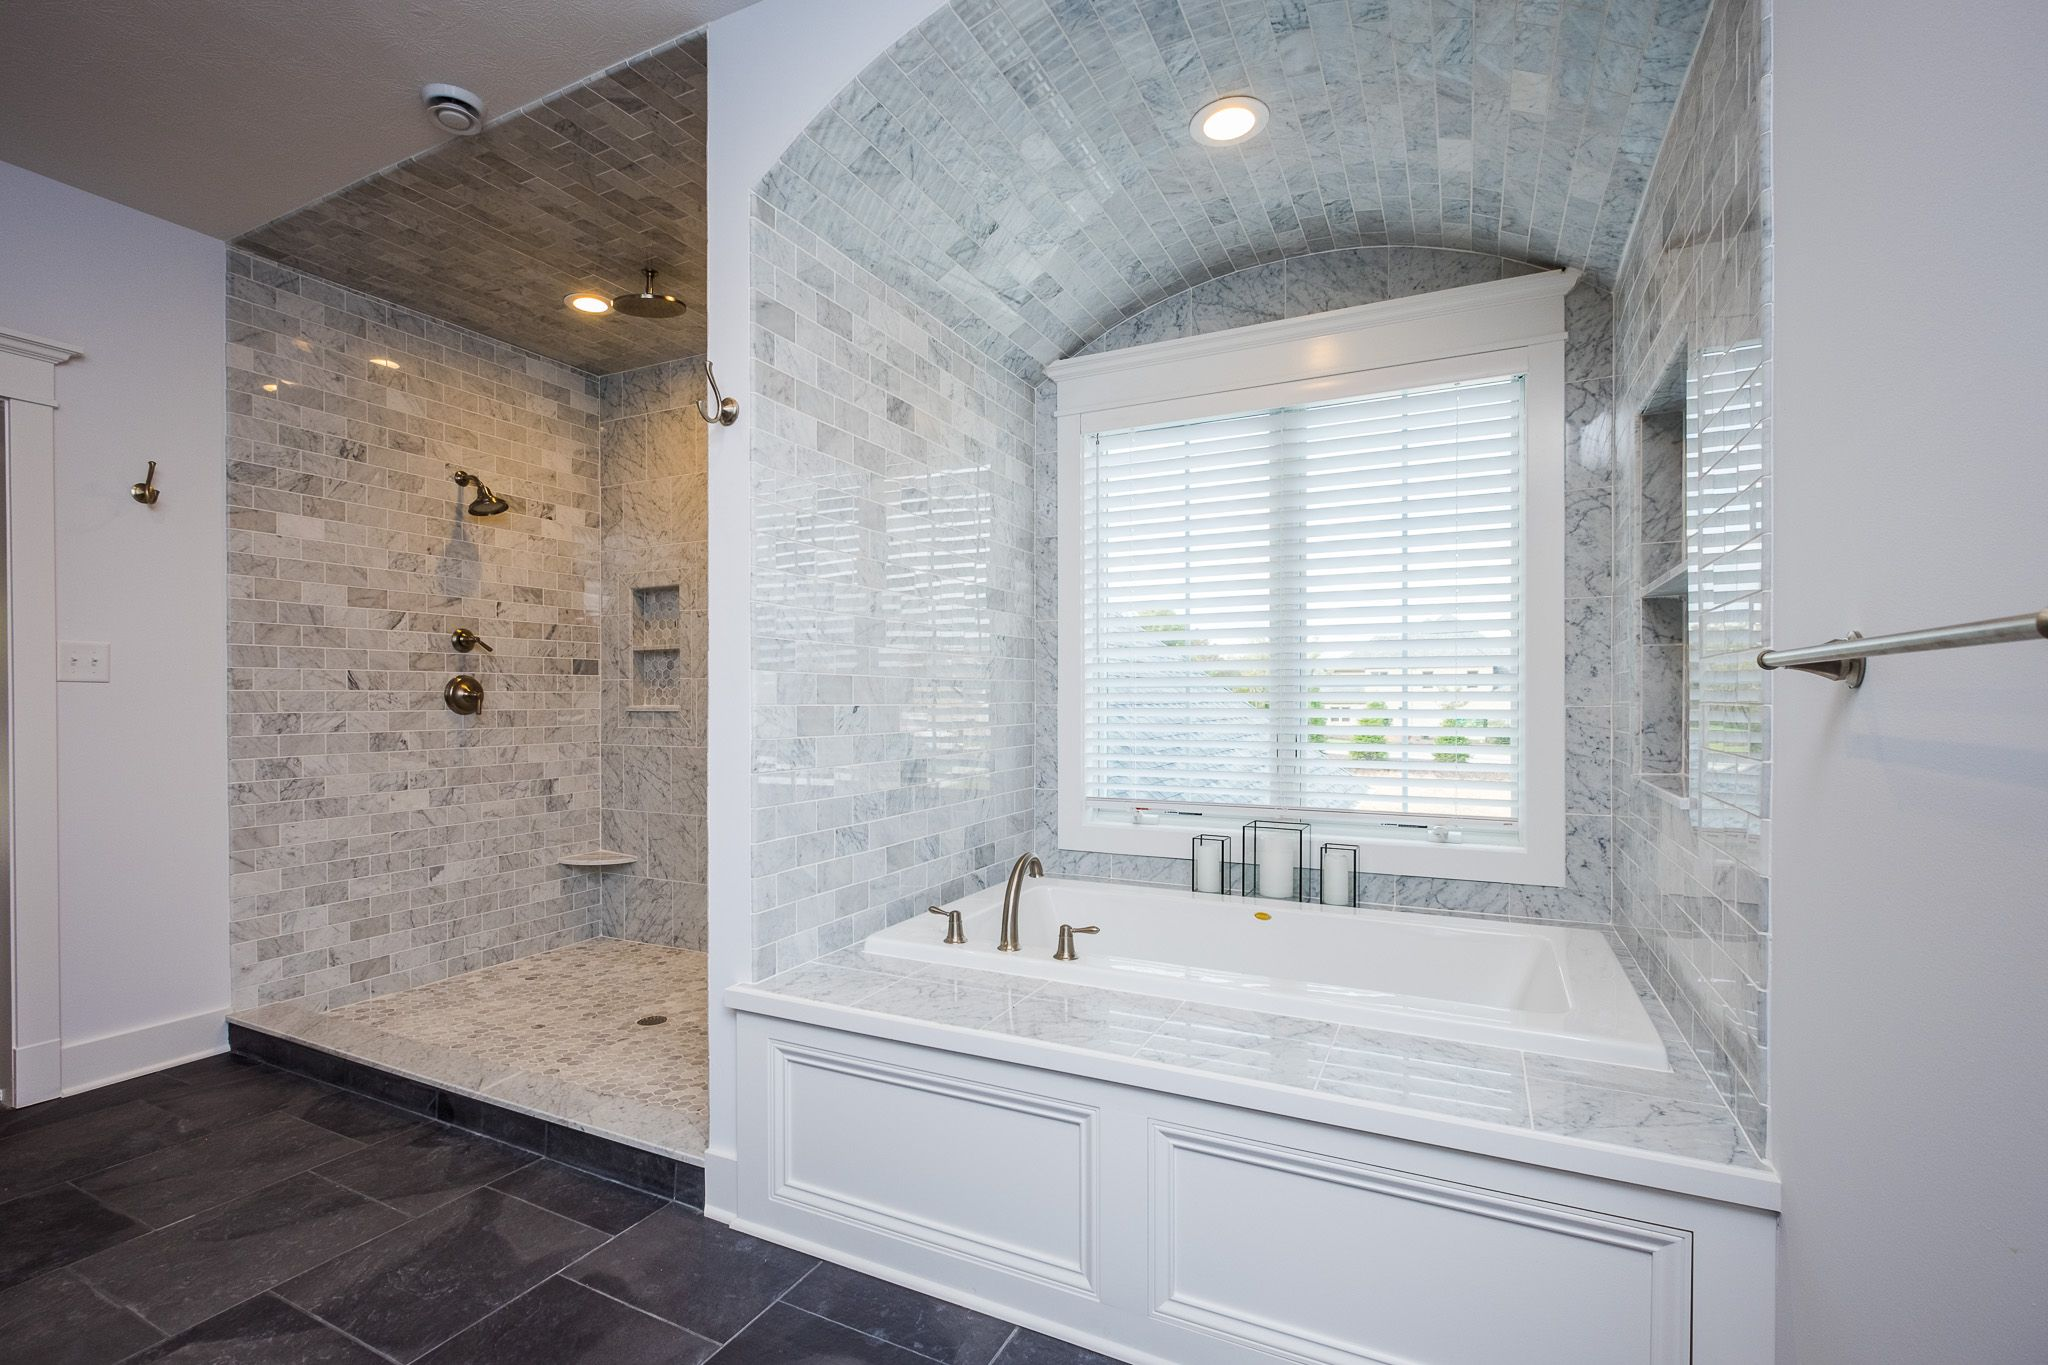 Dream master bathrooms tubs - Dream Master Bathroom With Custom Tile Work Kohler Soaking Tub Surrounded By Beautiful Grey Tile